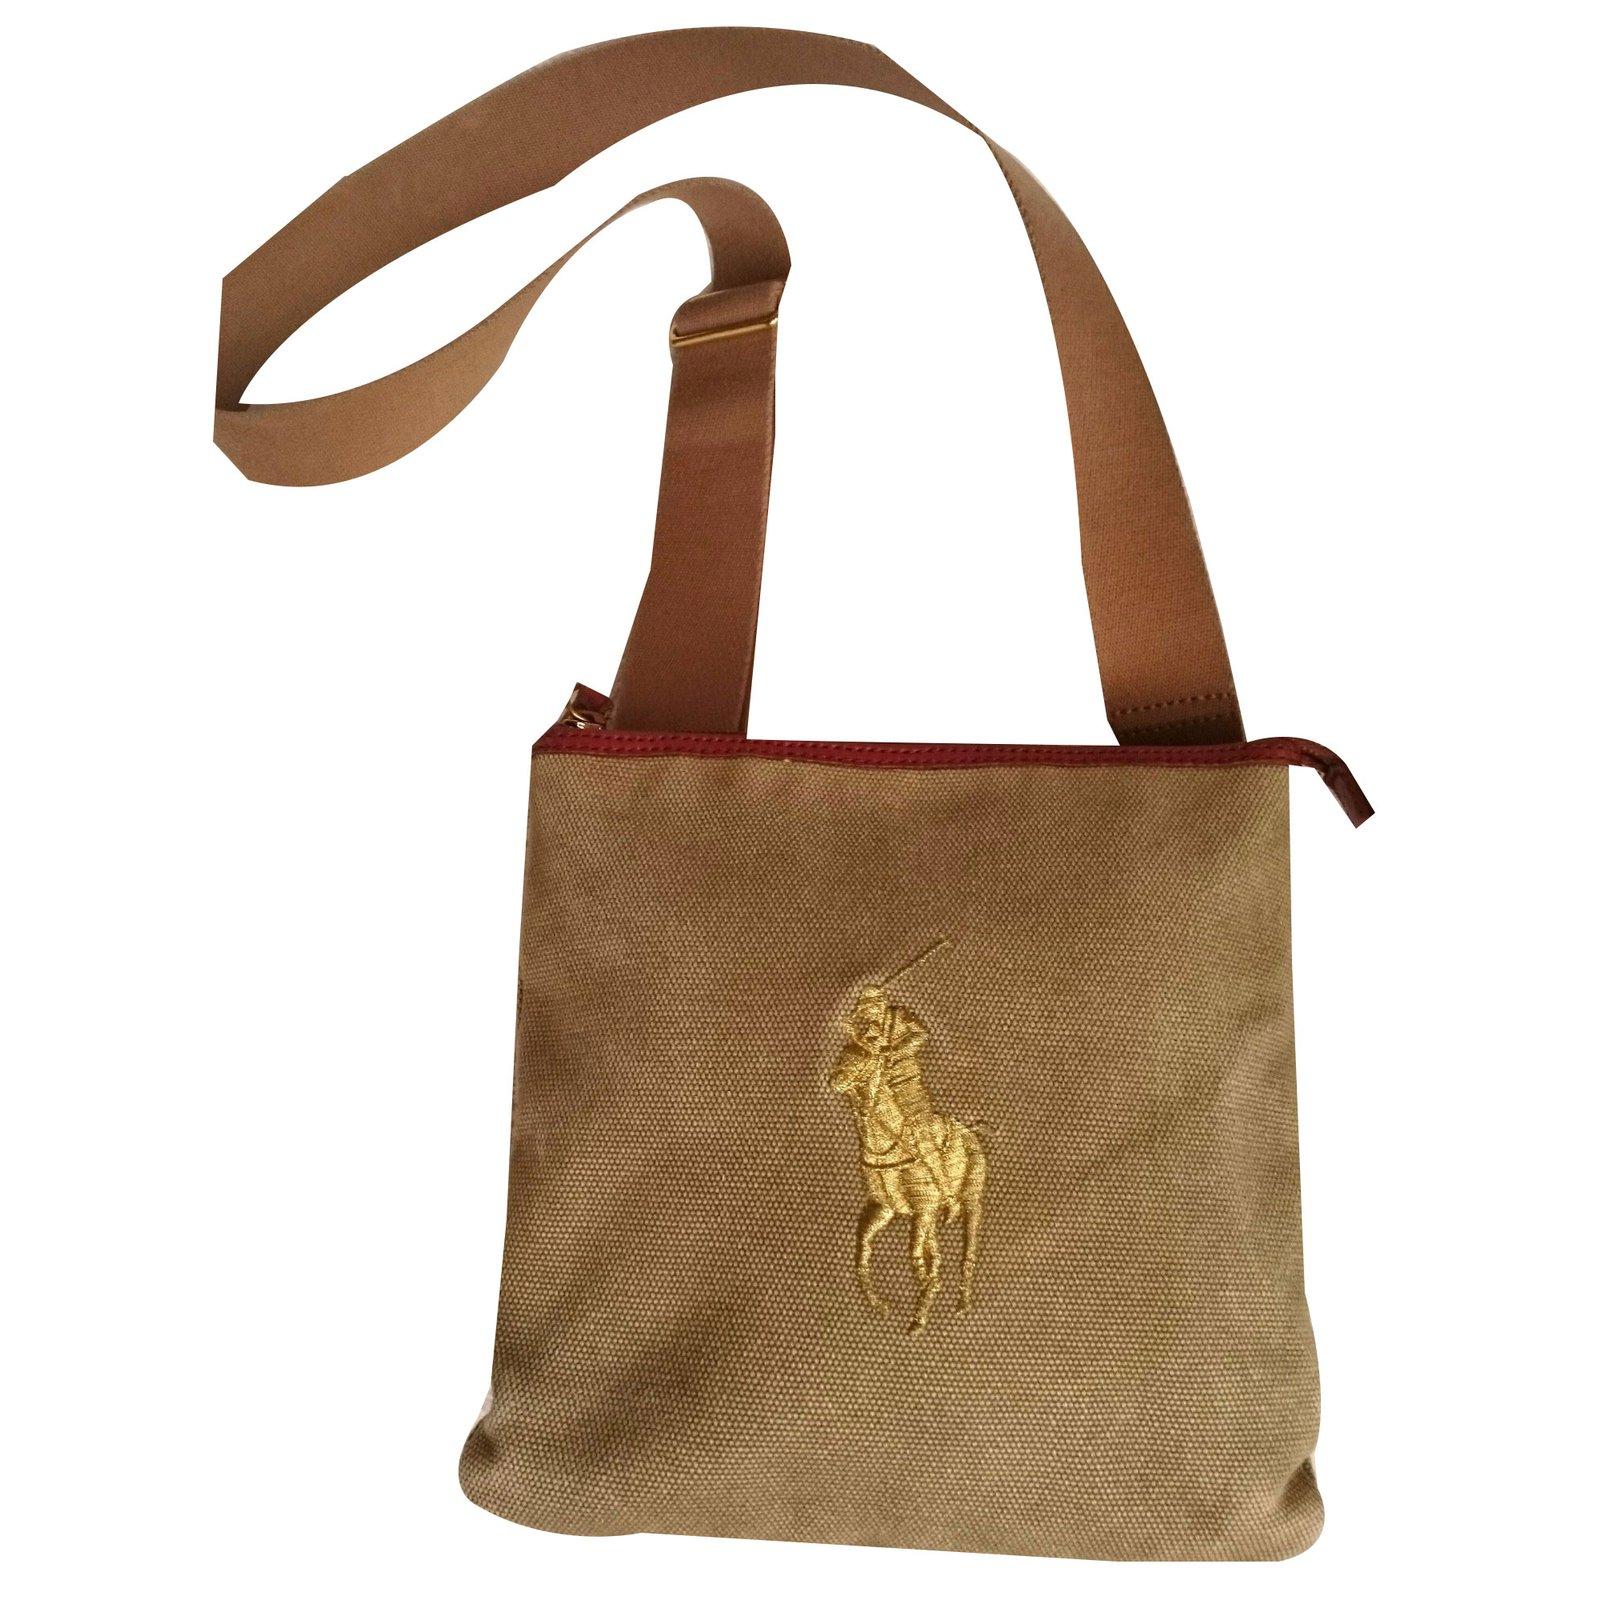 eee068e25b9a ... coupon for ralph lauren ralph lauren bag handbags leathercloth  beigekhaki ref.54103 c4af1 f80bc ...